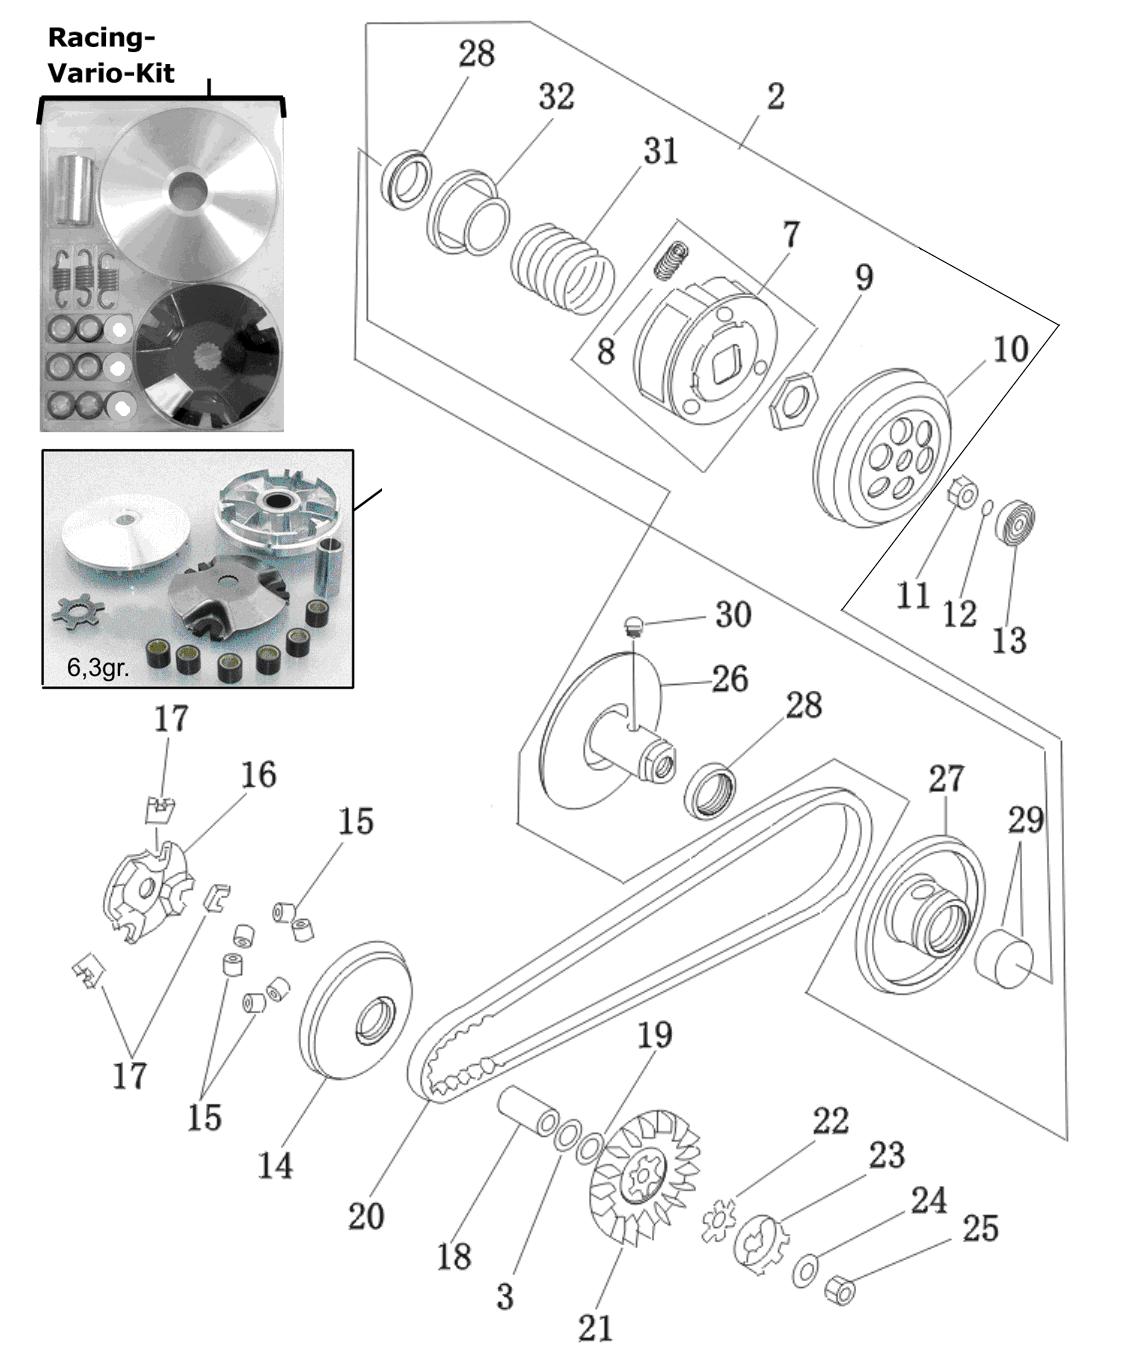 Kupplung / Variomatik